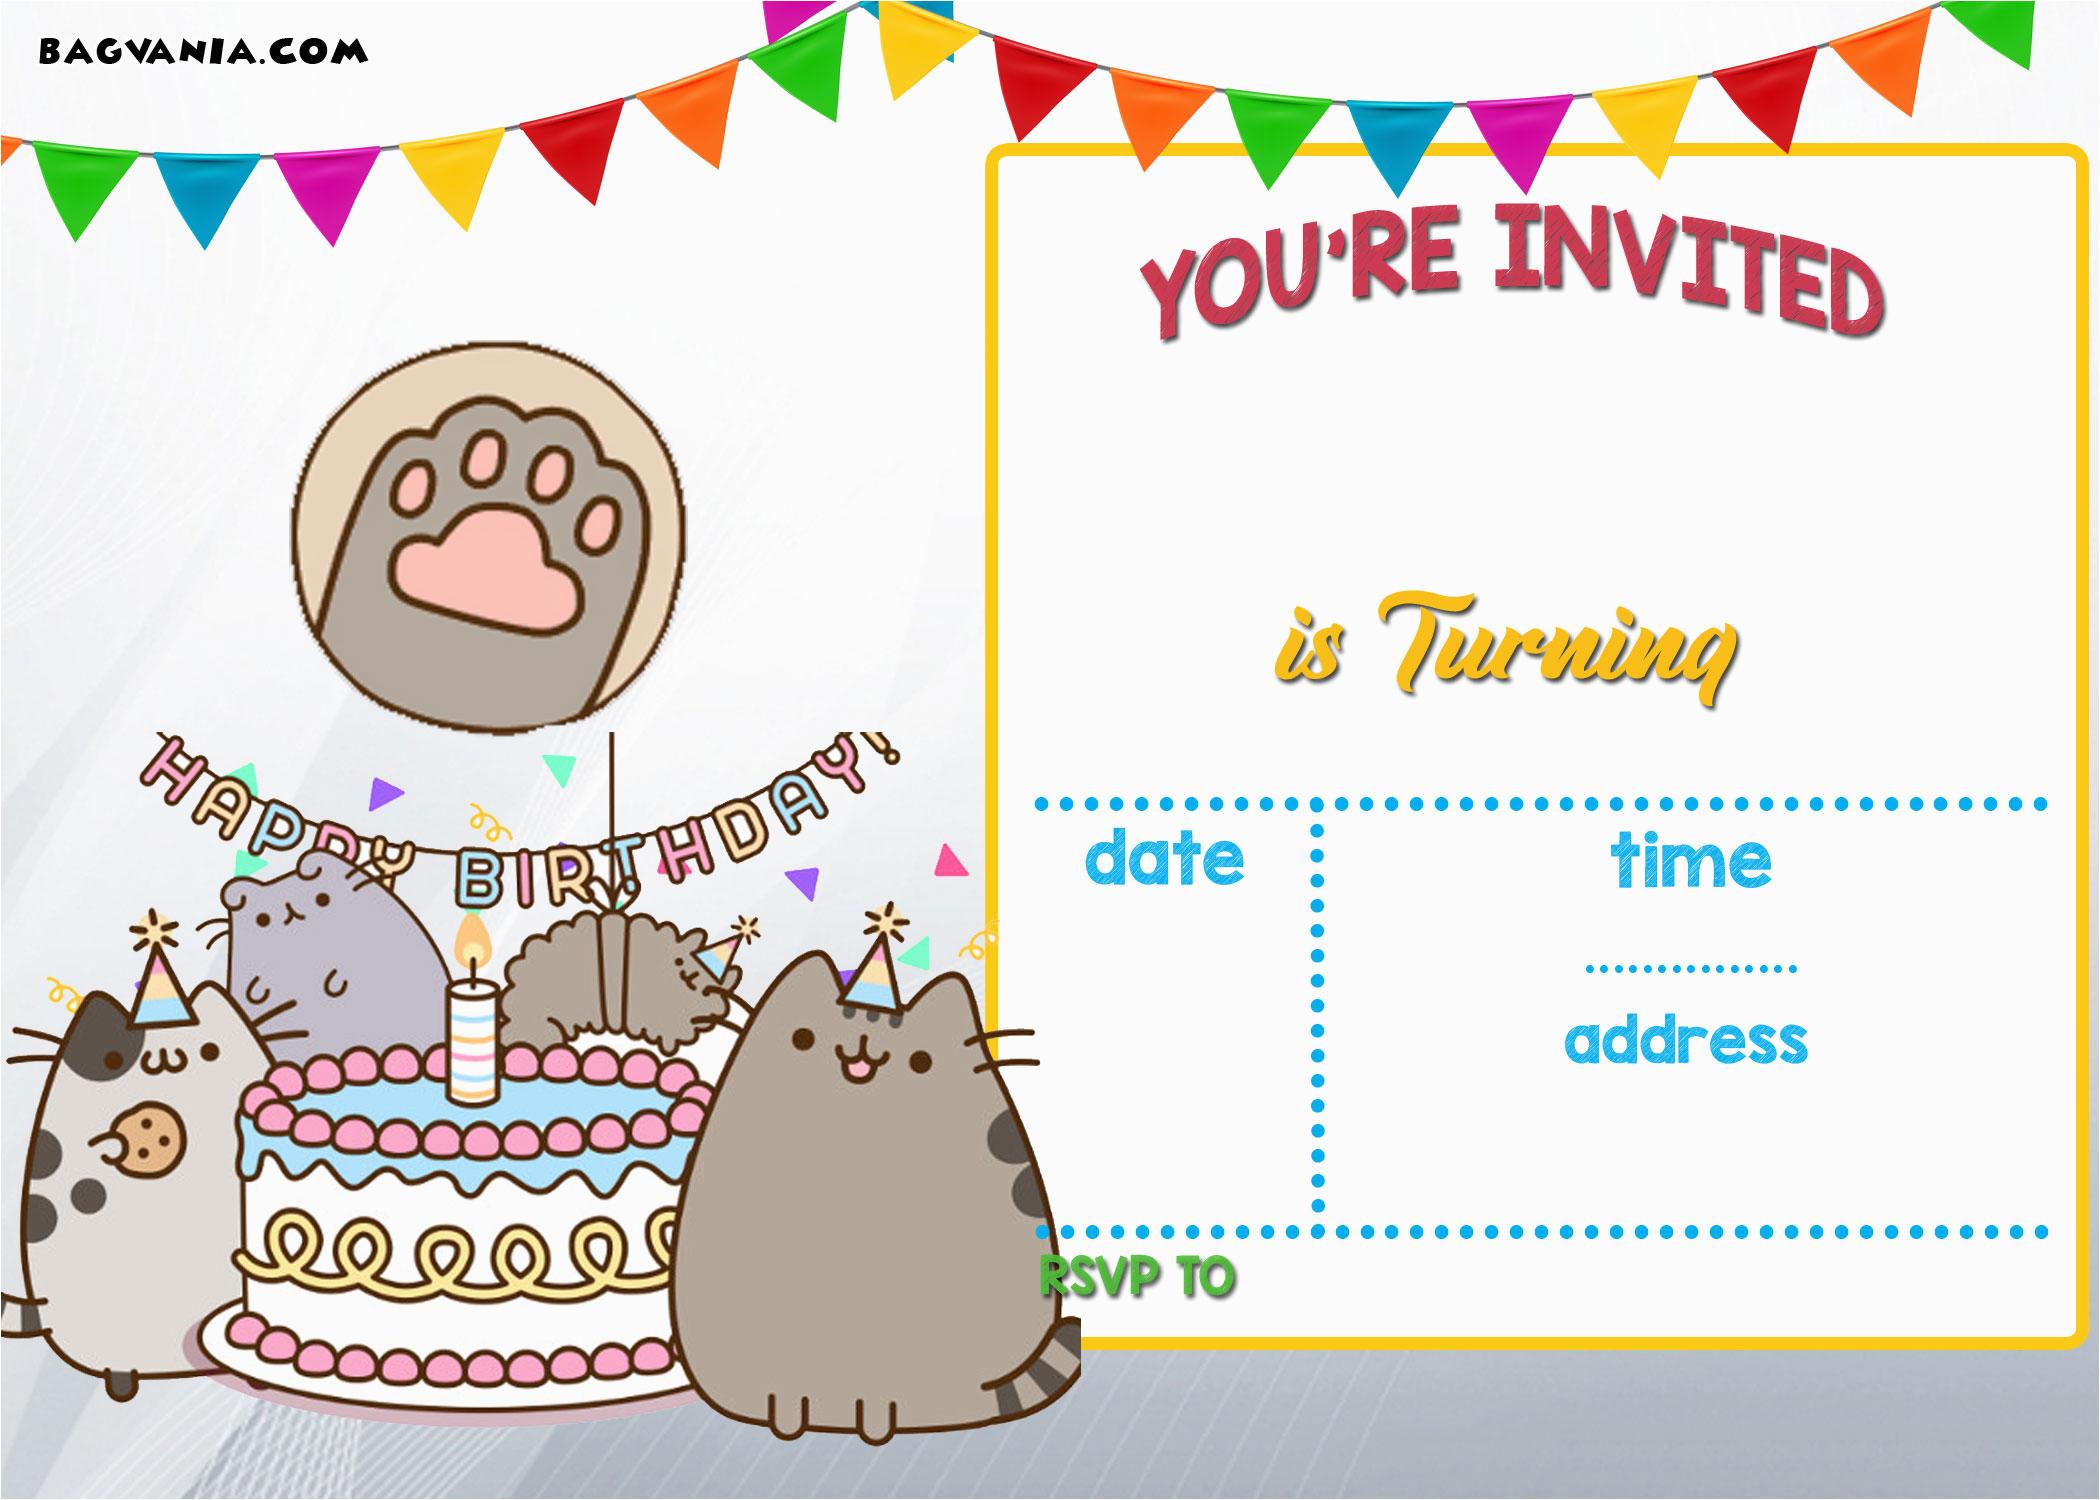 Pusheen Birthday Invitations Free Printable Pusheen Birthday Invitation Template Free